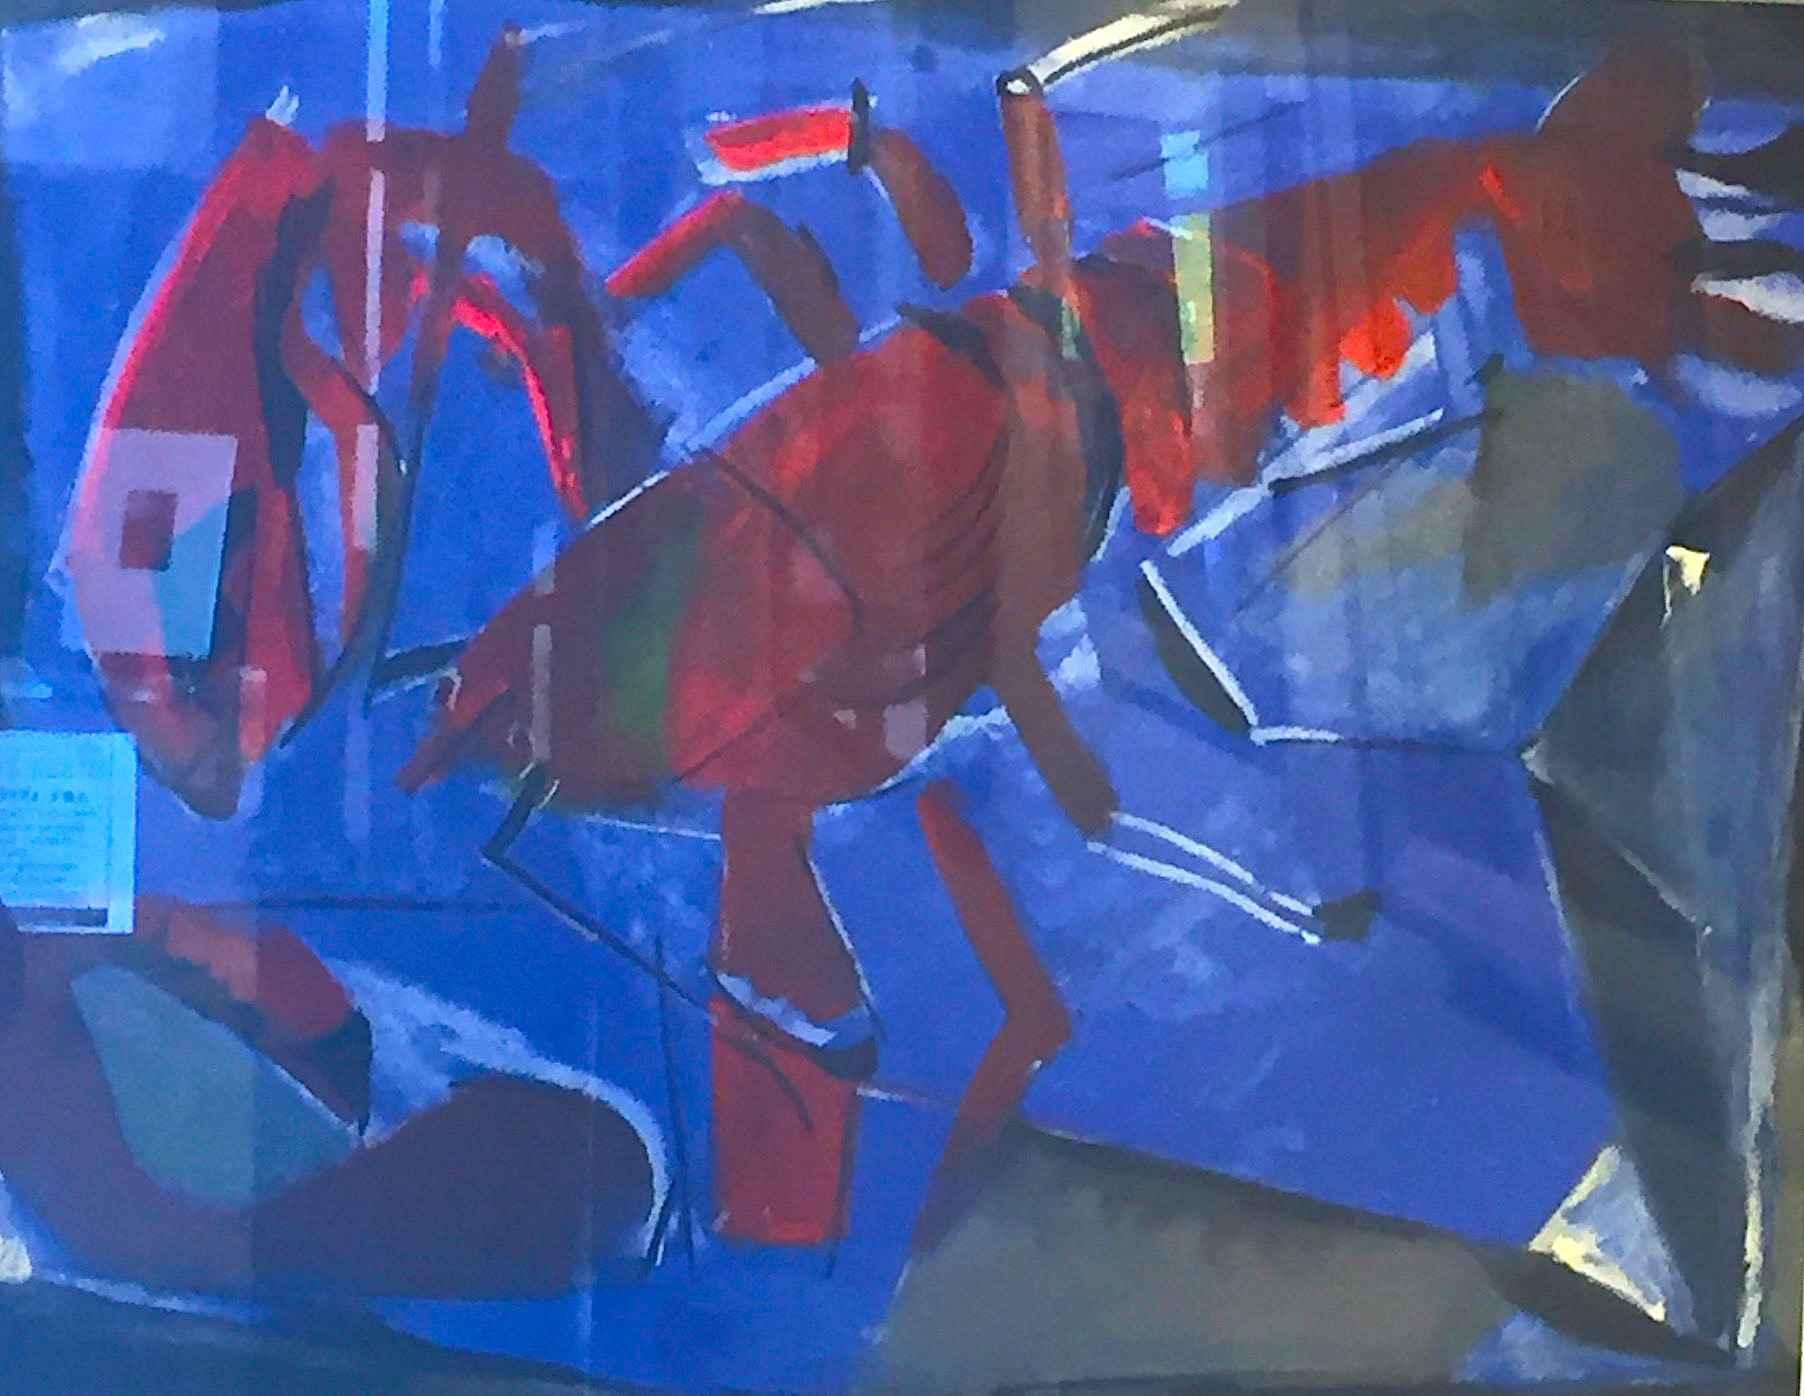 Lobster by  Vaclav Vytlacil - Masterpiece Online